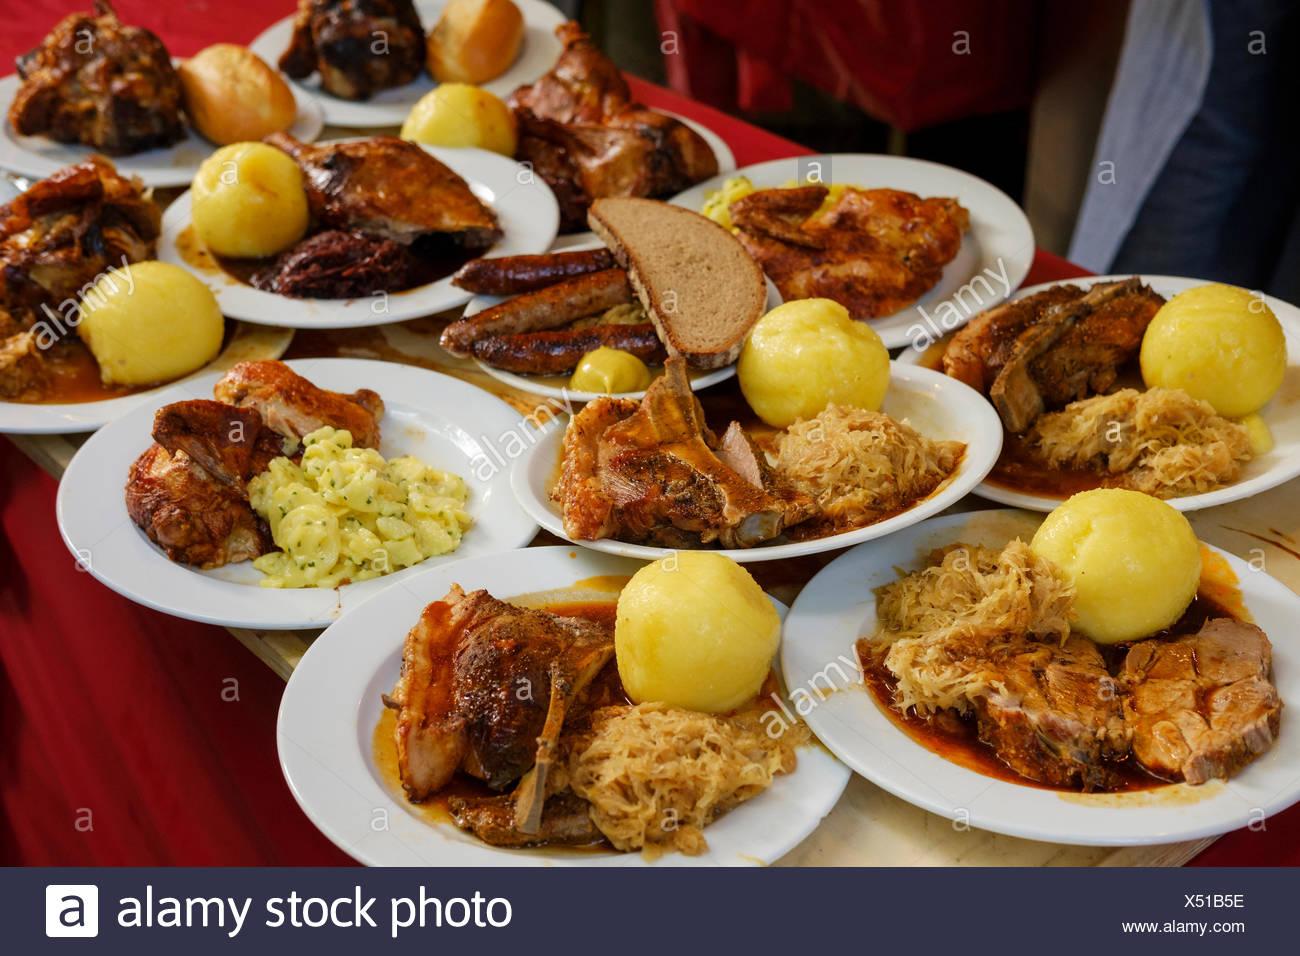 Tray with various dishes, Erlanger Bergkirchweih, Erlangen, Middle Franconia, Franconia, Bavaria, Germany - Stock Image